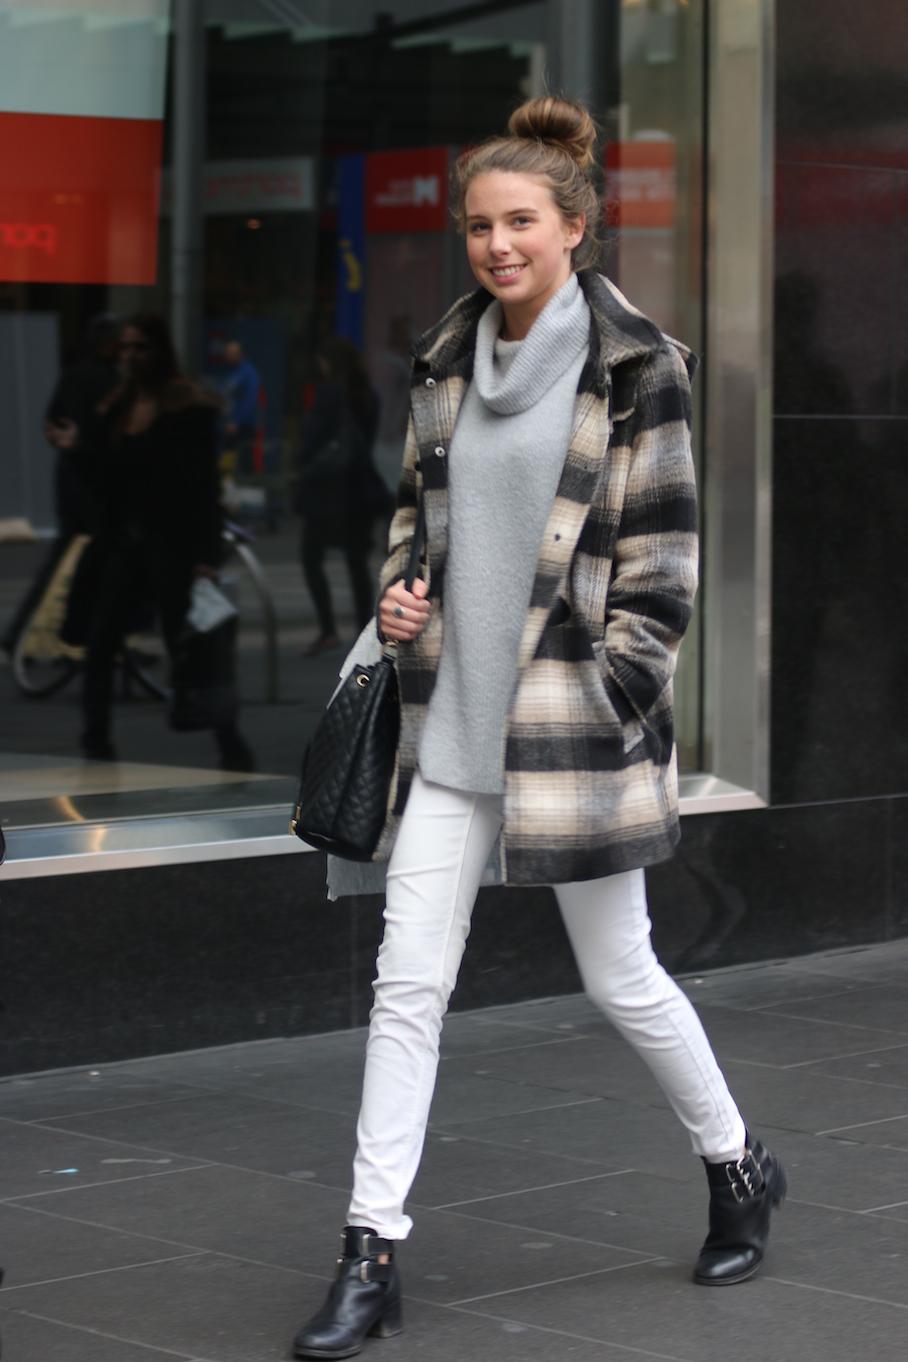 Vic: Sara Venter, Business/Arts student, Bourke St Melbourne. Photo: Tracie Sullivan.